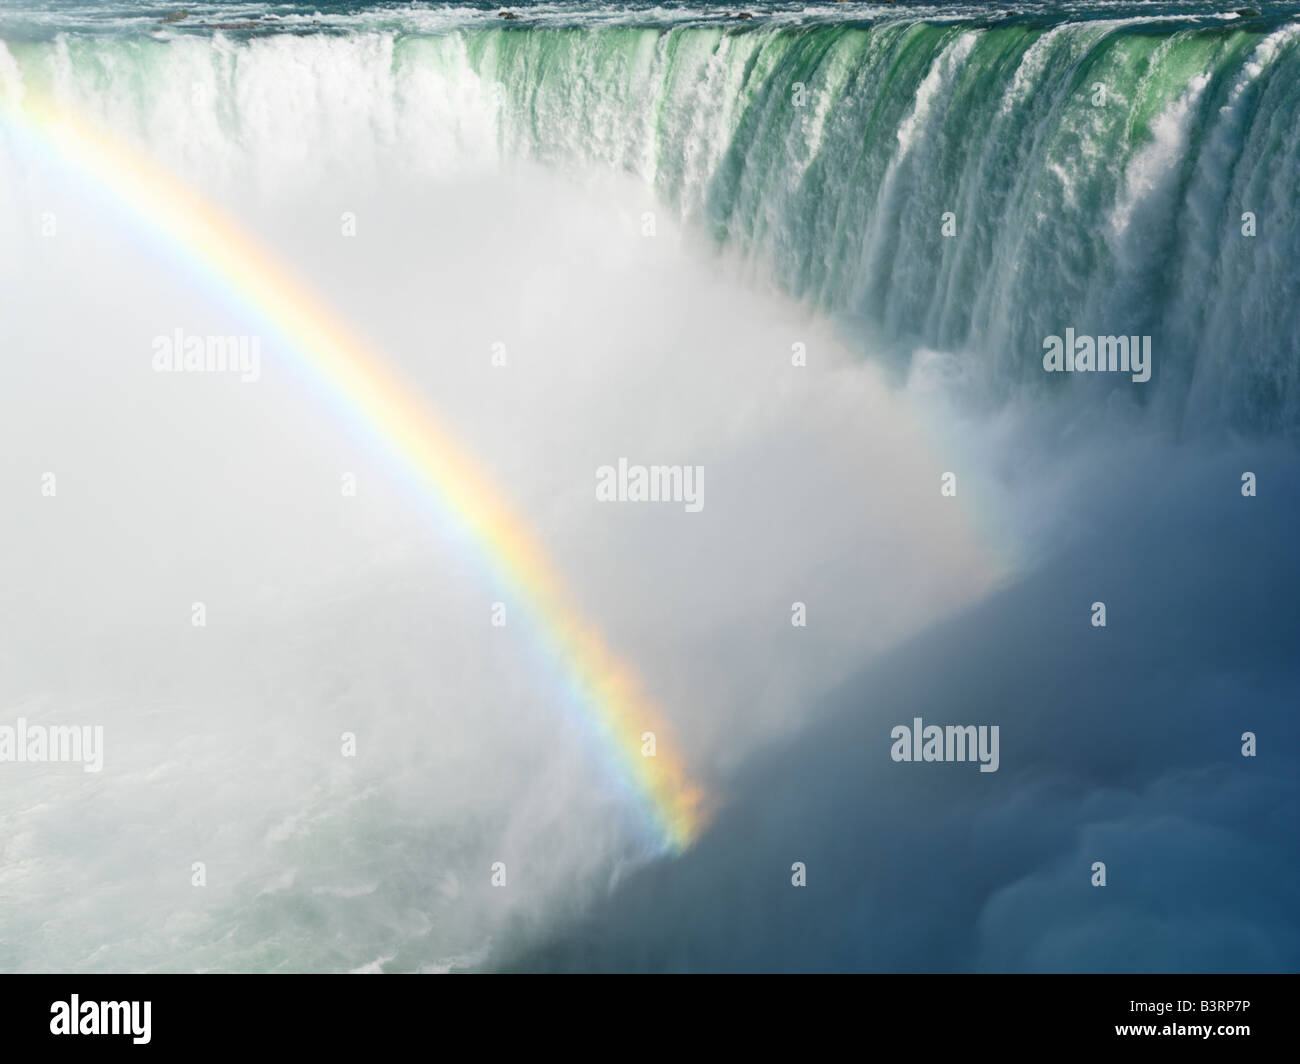 Canada,Ontario,Niagara Falls,Canadian Falls with a rainbow - Stock Image